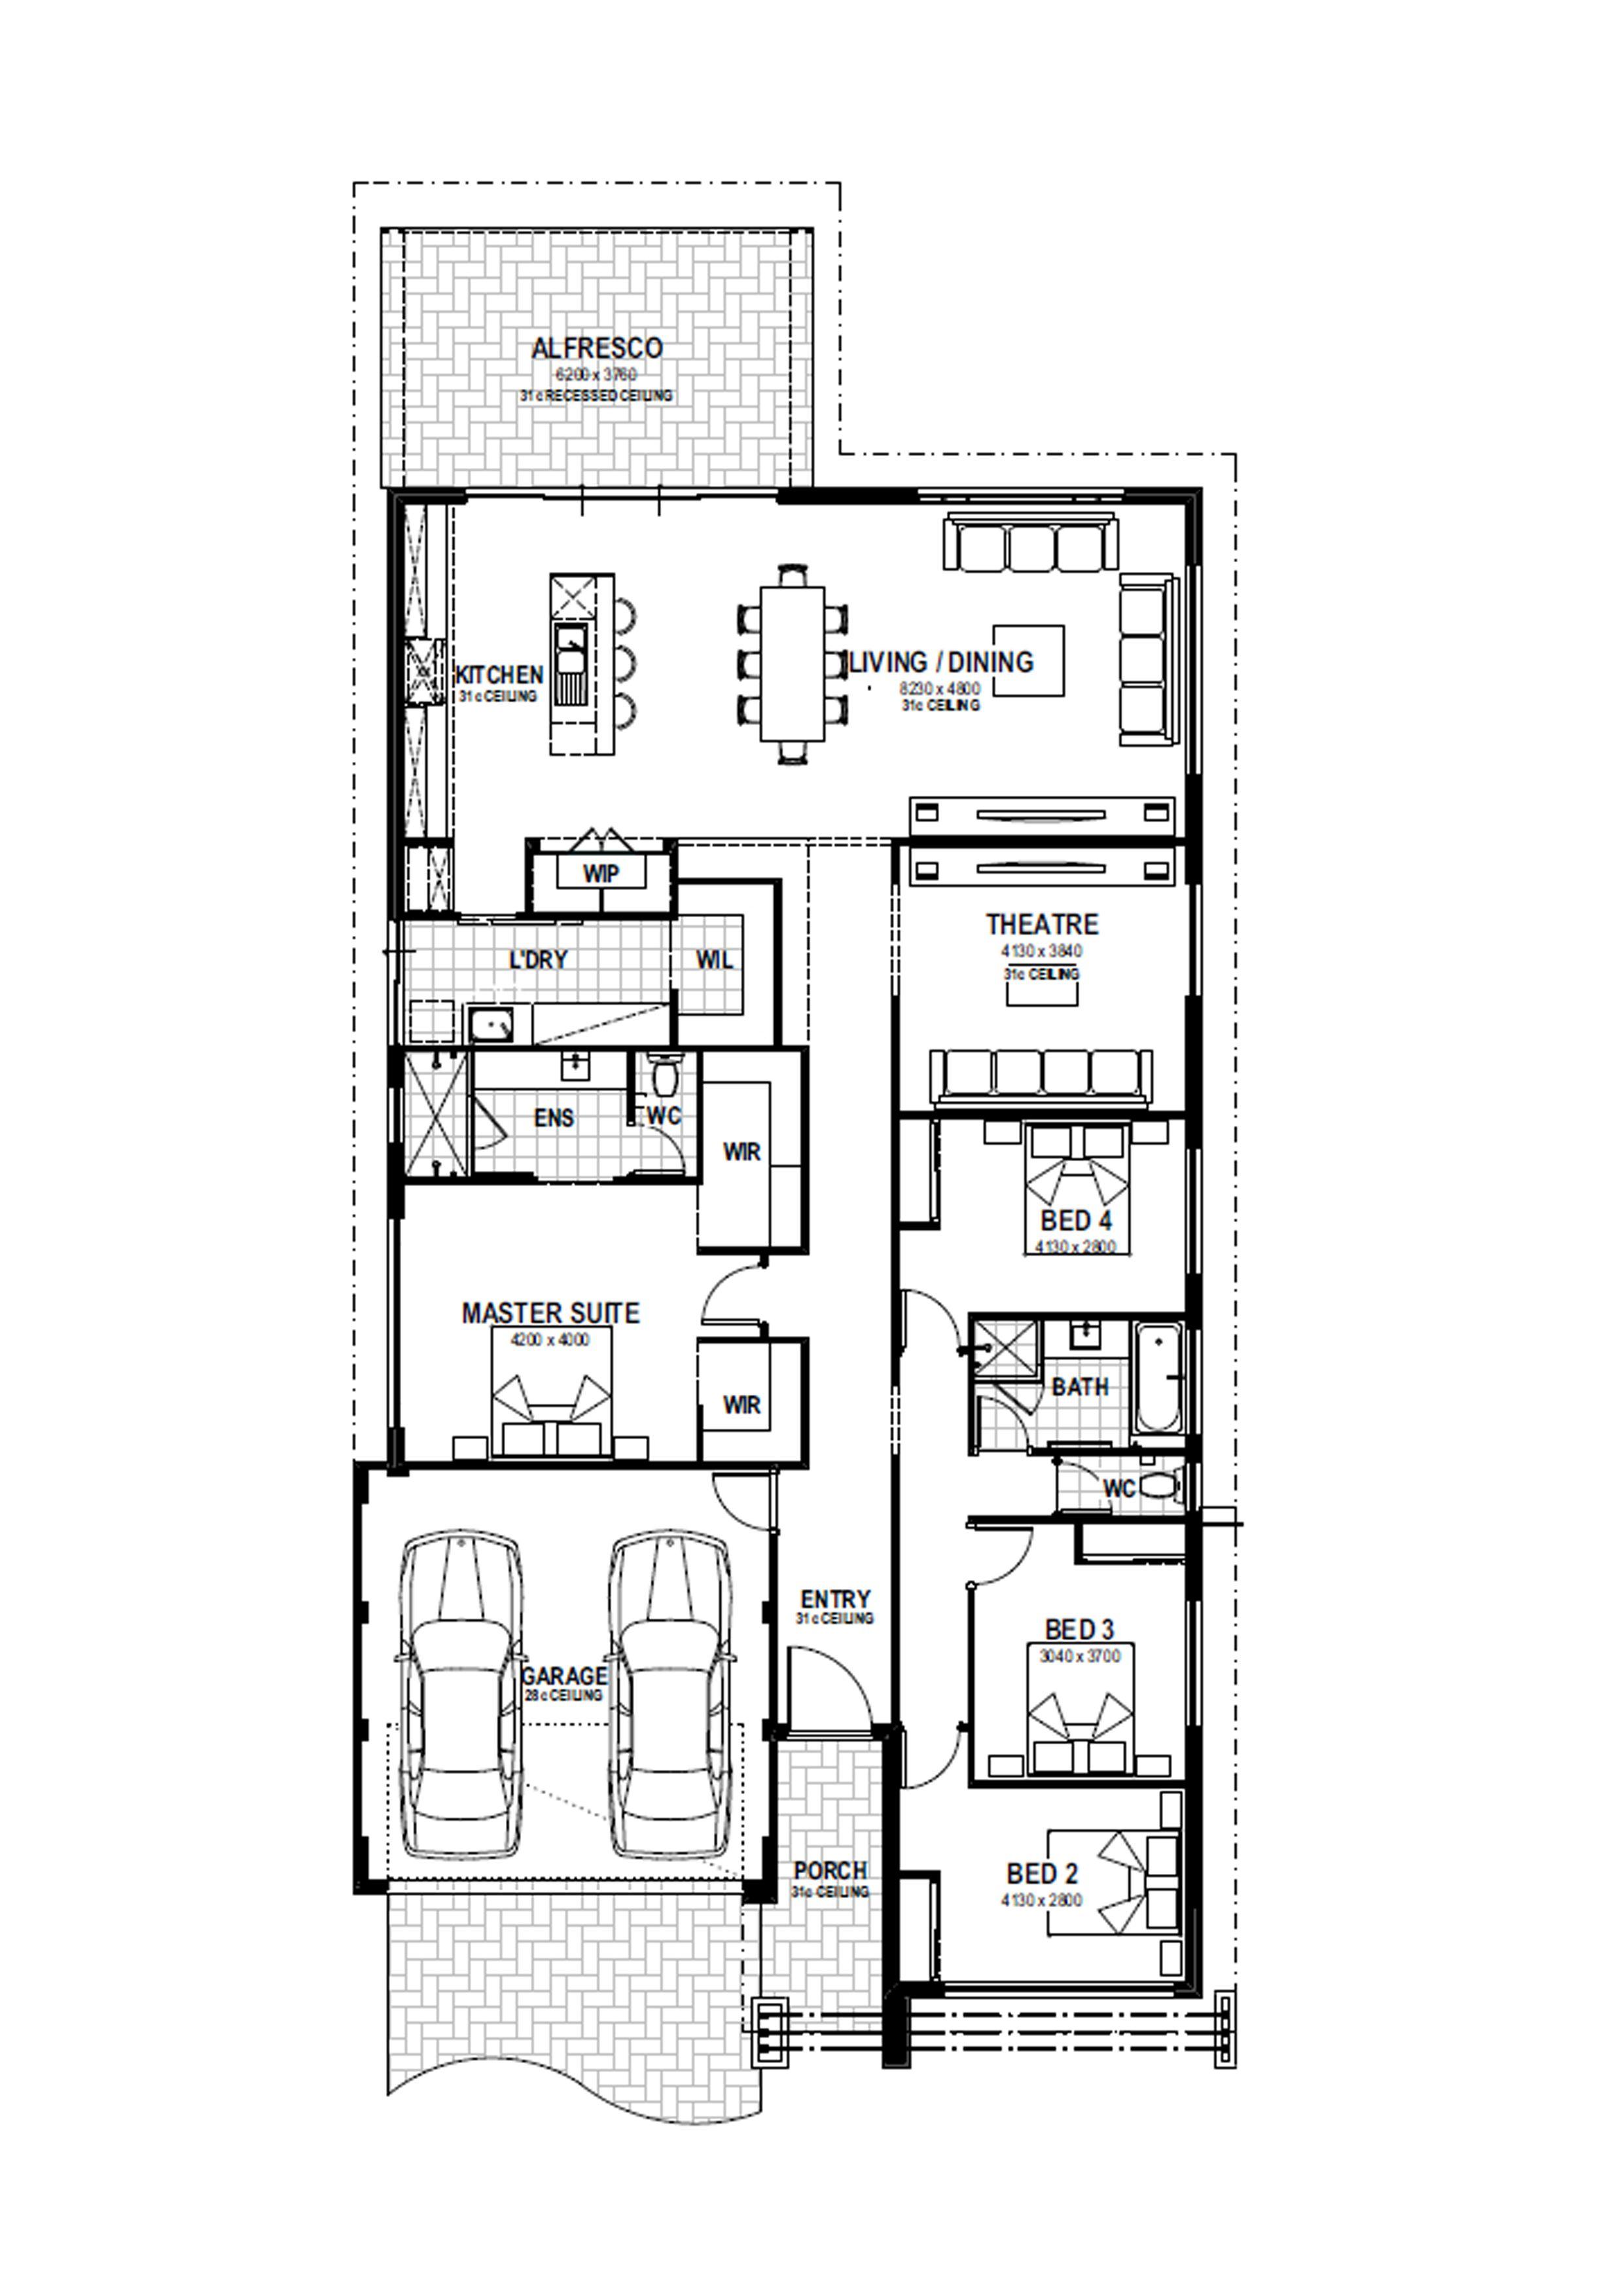 Capri Floorplan  Hauspläne  Pinterest  Bungalow Häuser